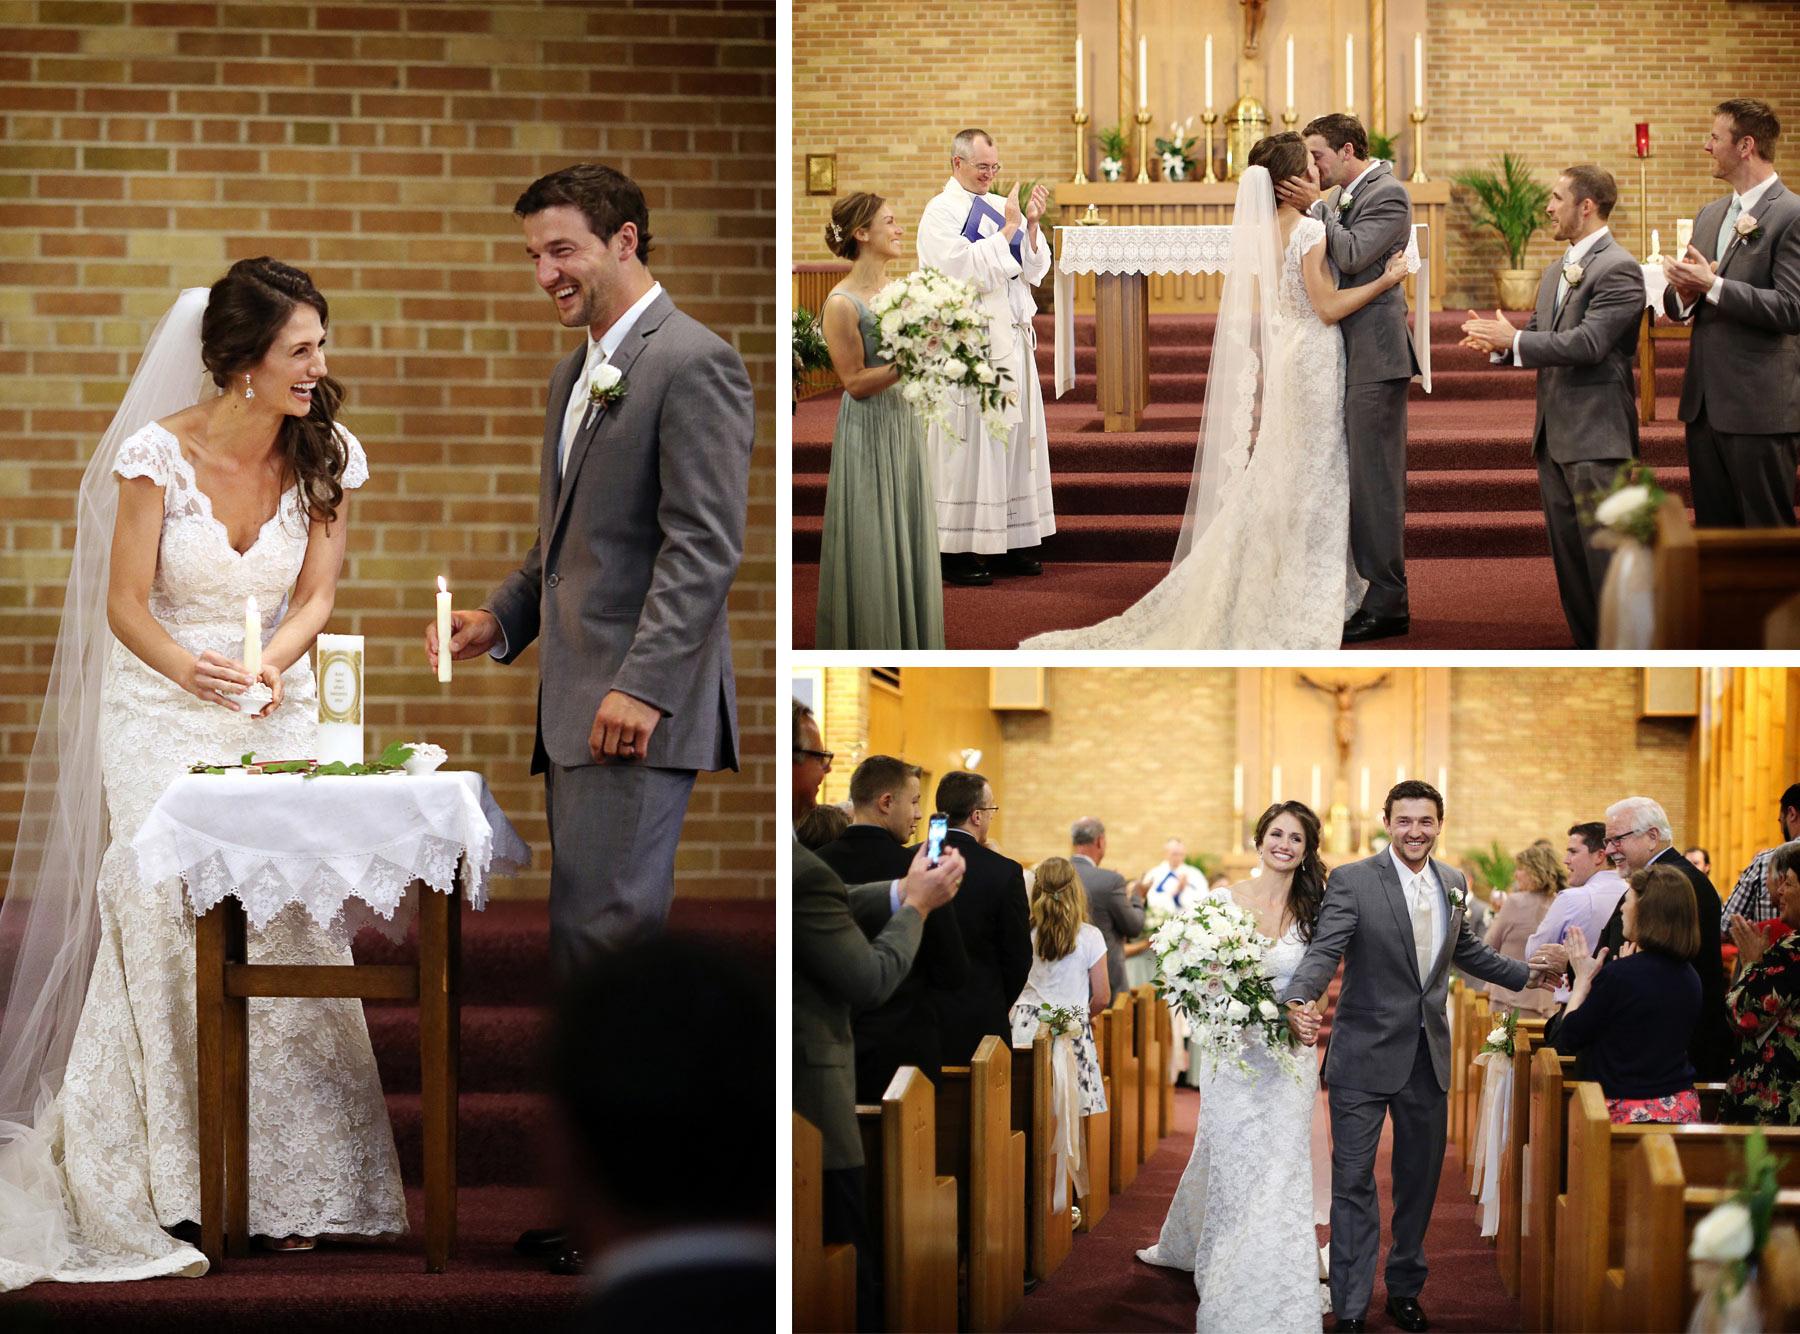 06-Stillwater-Minnesota-Wedding-Photography-by-Vick-Photography--St-Patricks-Church-Ceremony-Alicia-&-Cole.jpg